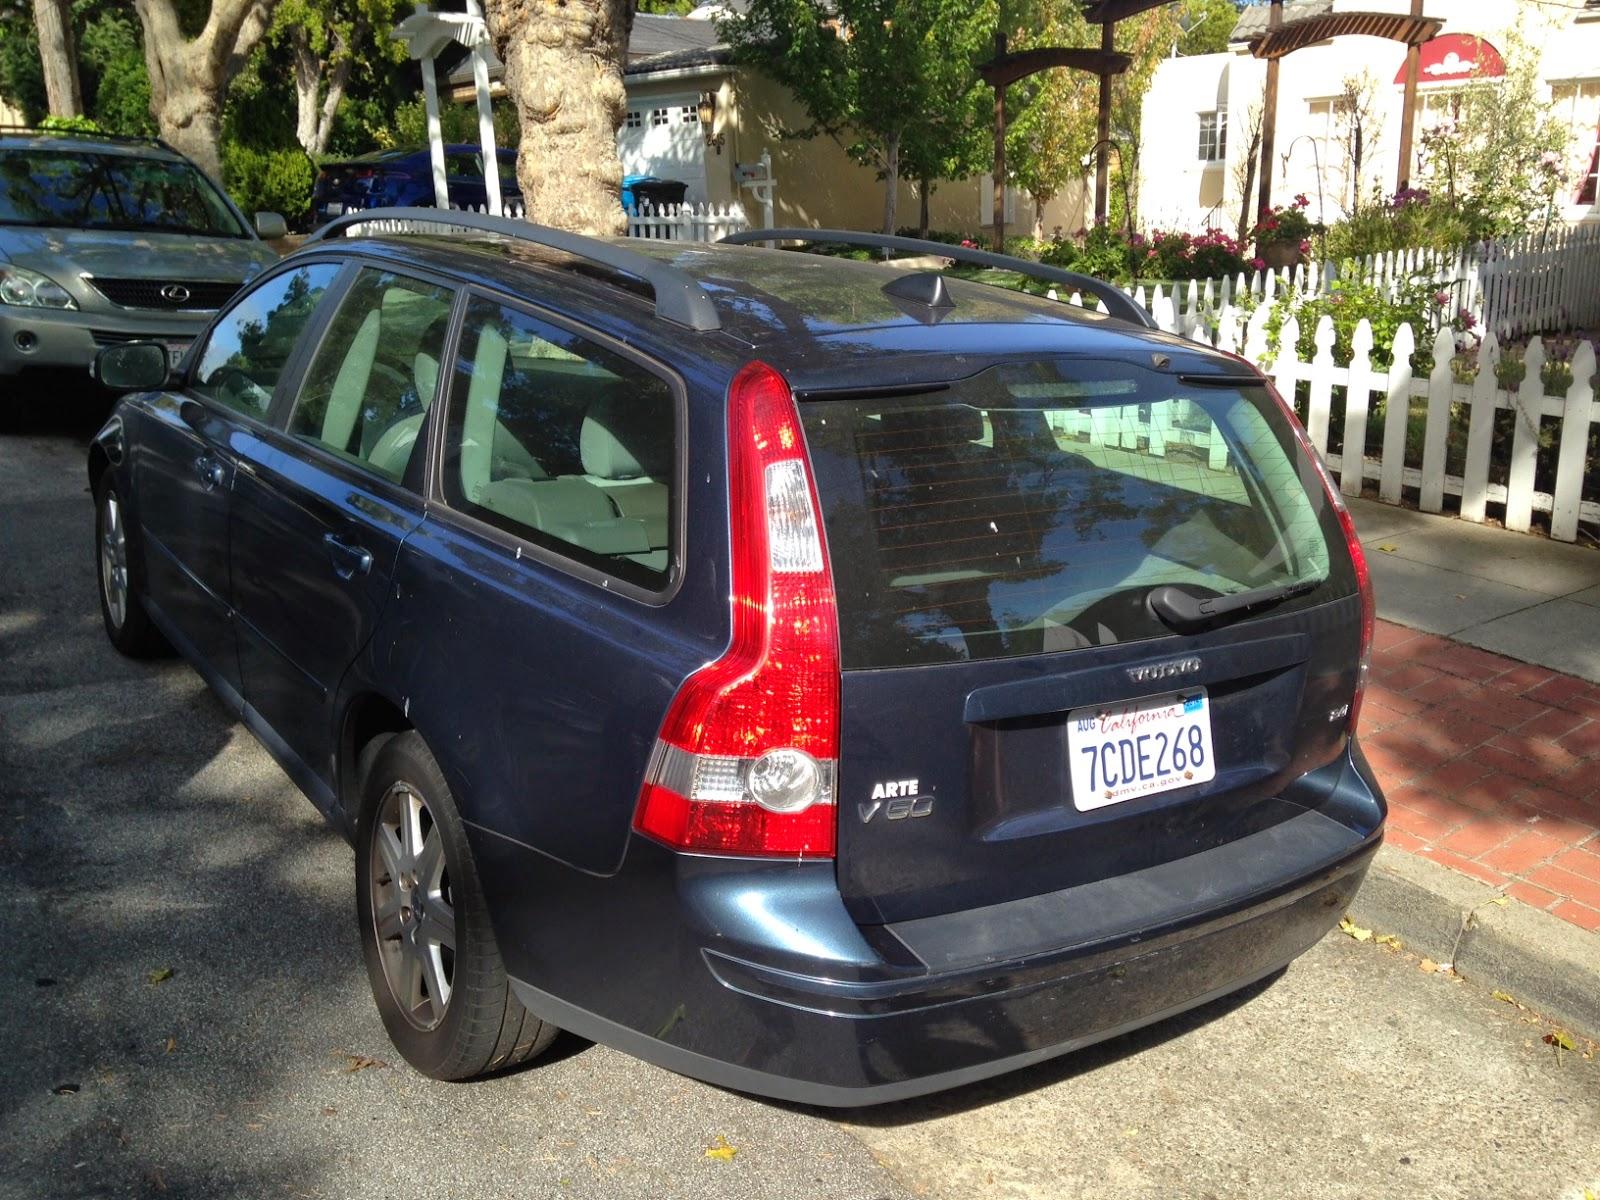 Craigslist Washington Dc Used Cars By Owner - 2019-2020 ...